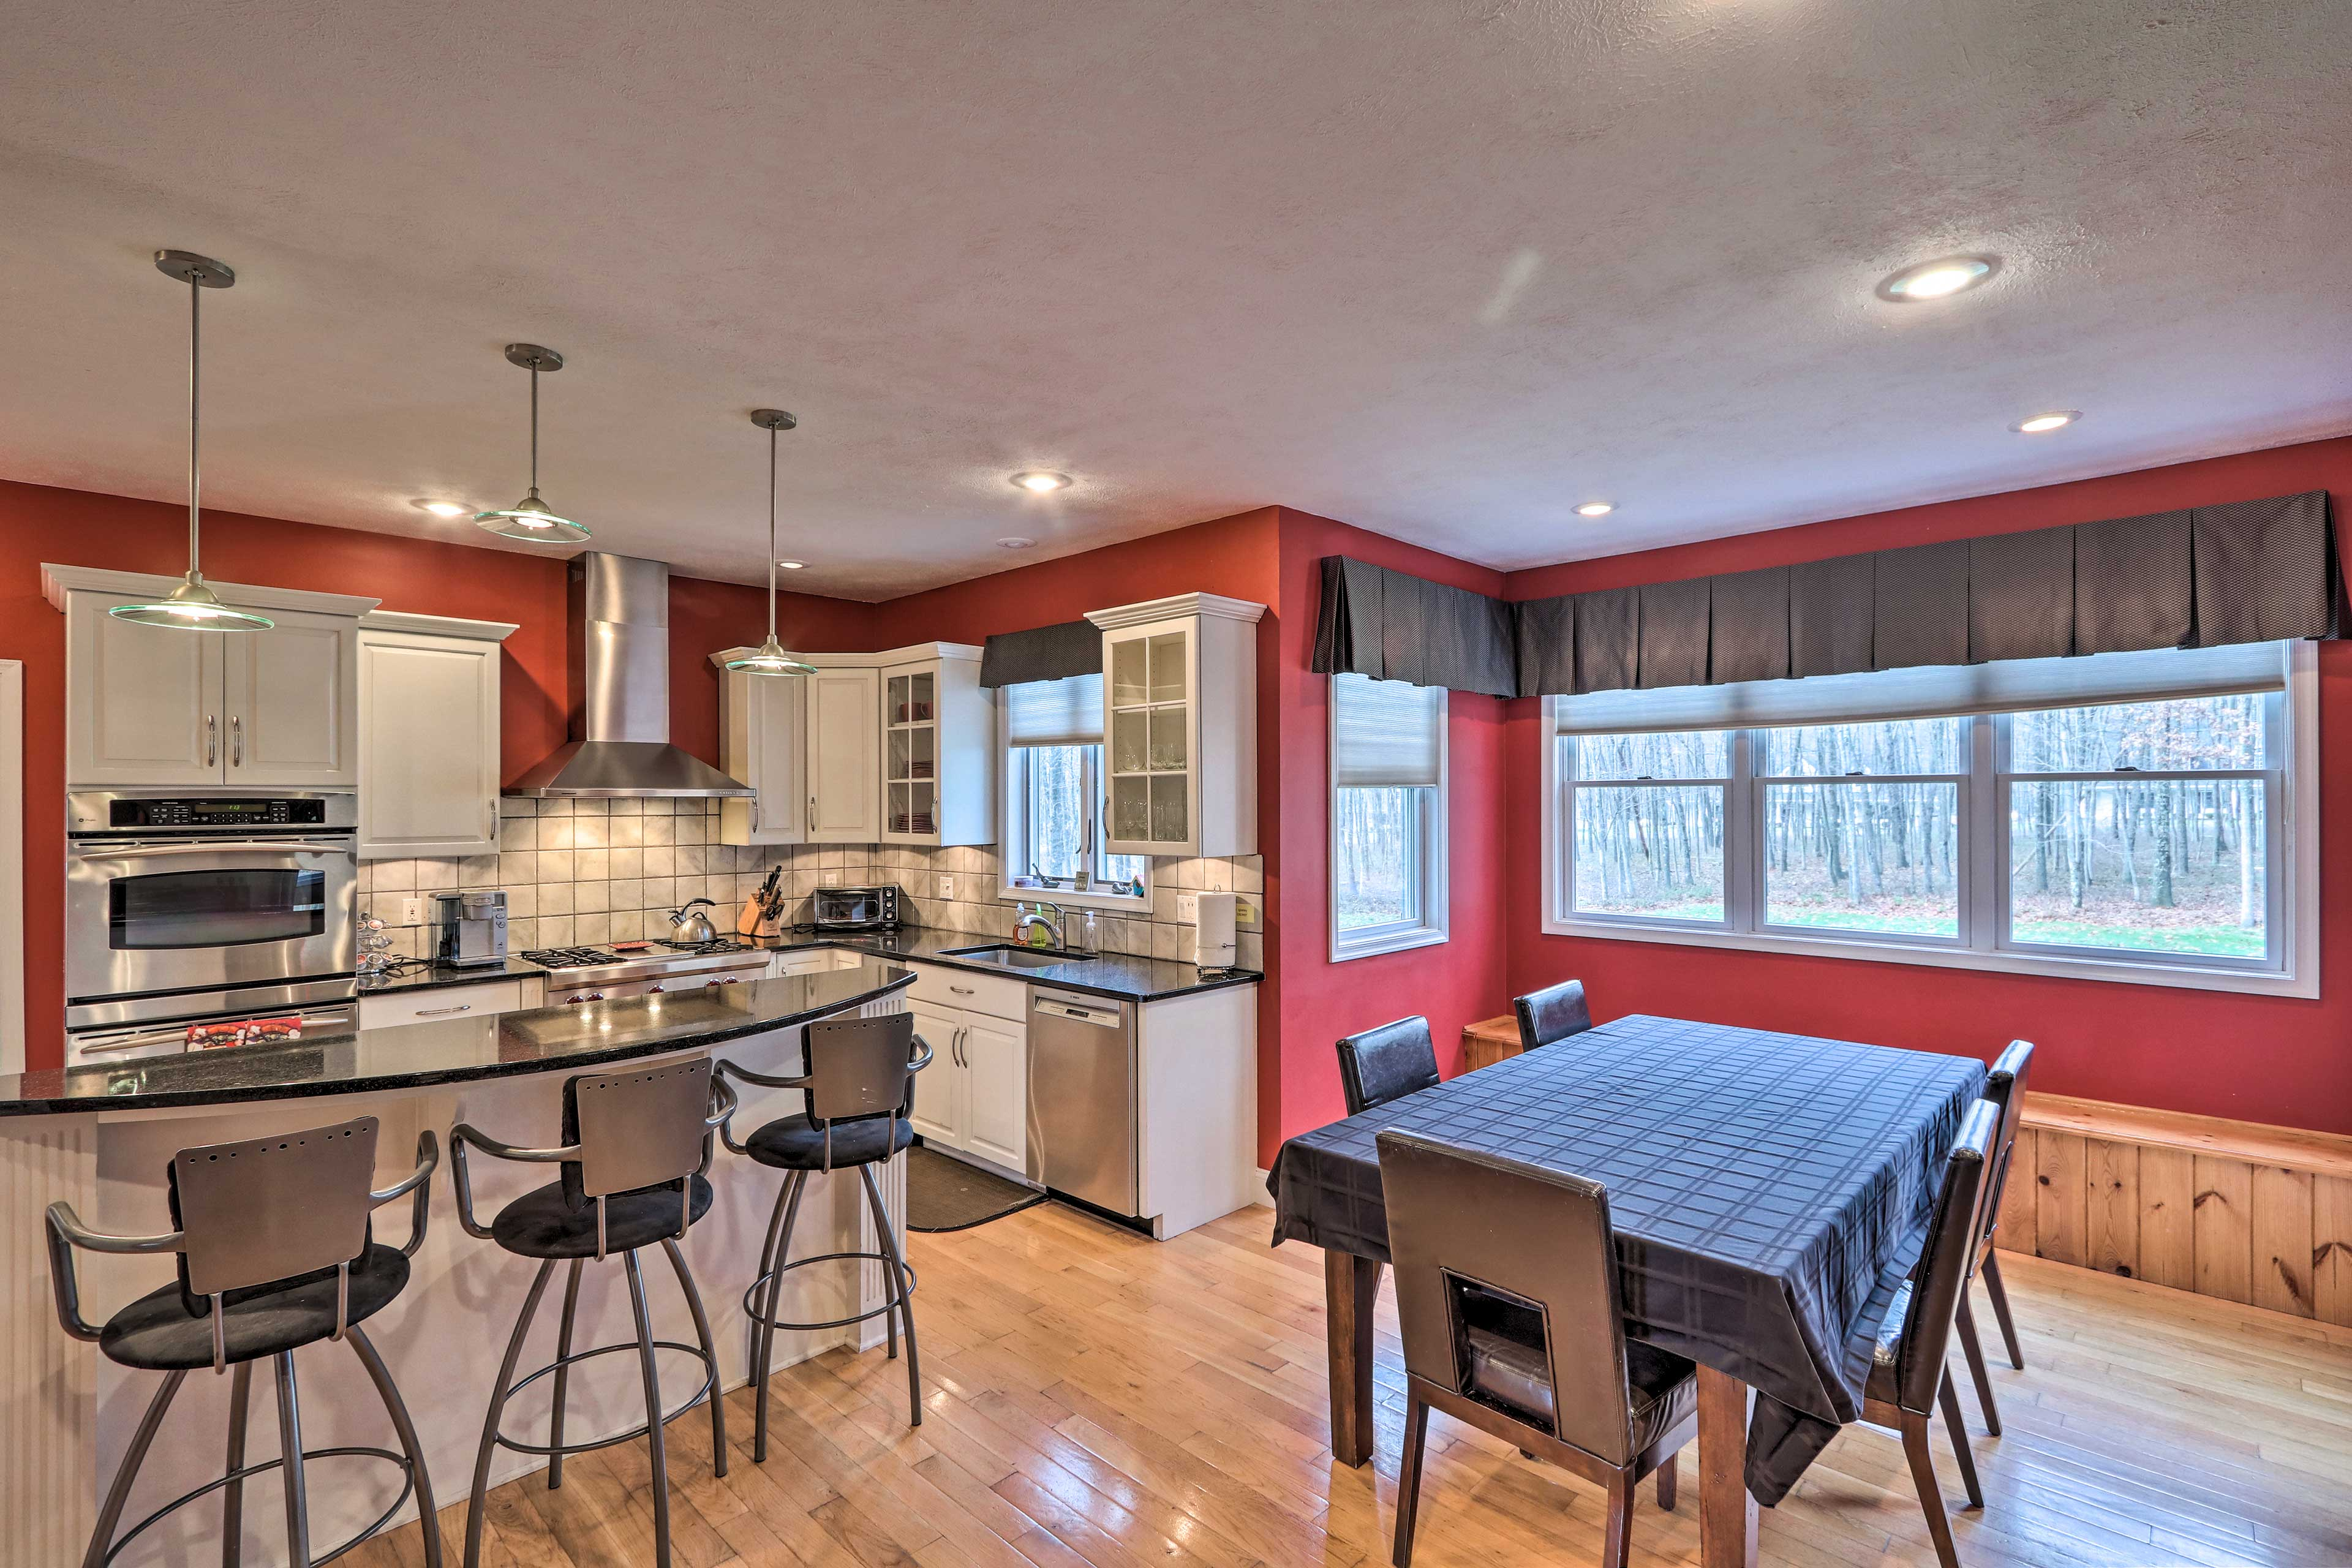 Natural light illuminates this kitchen and dining area.